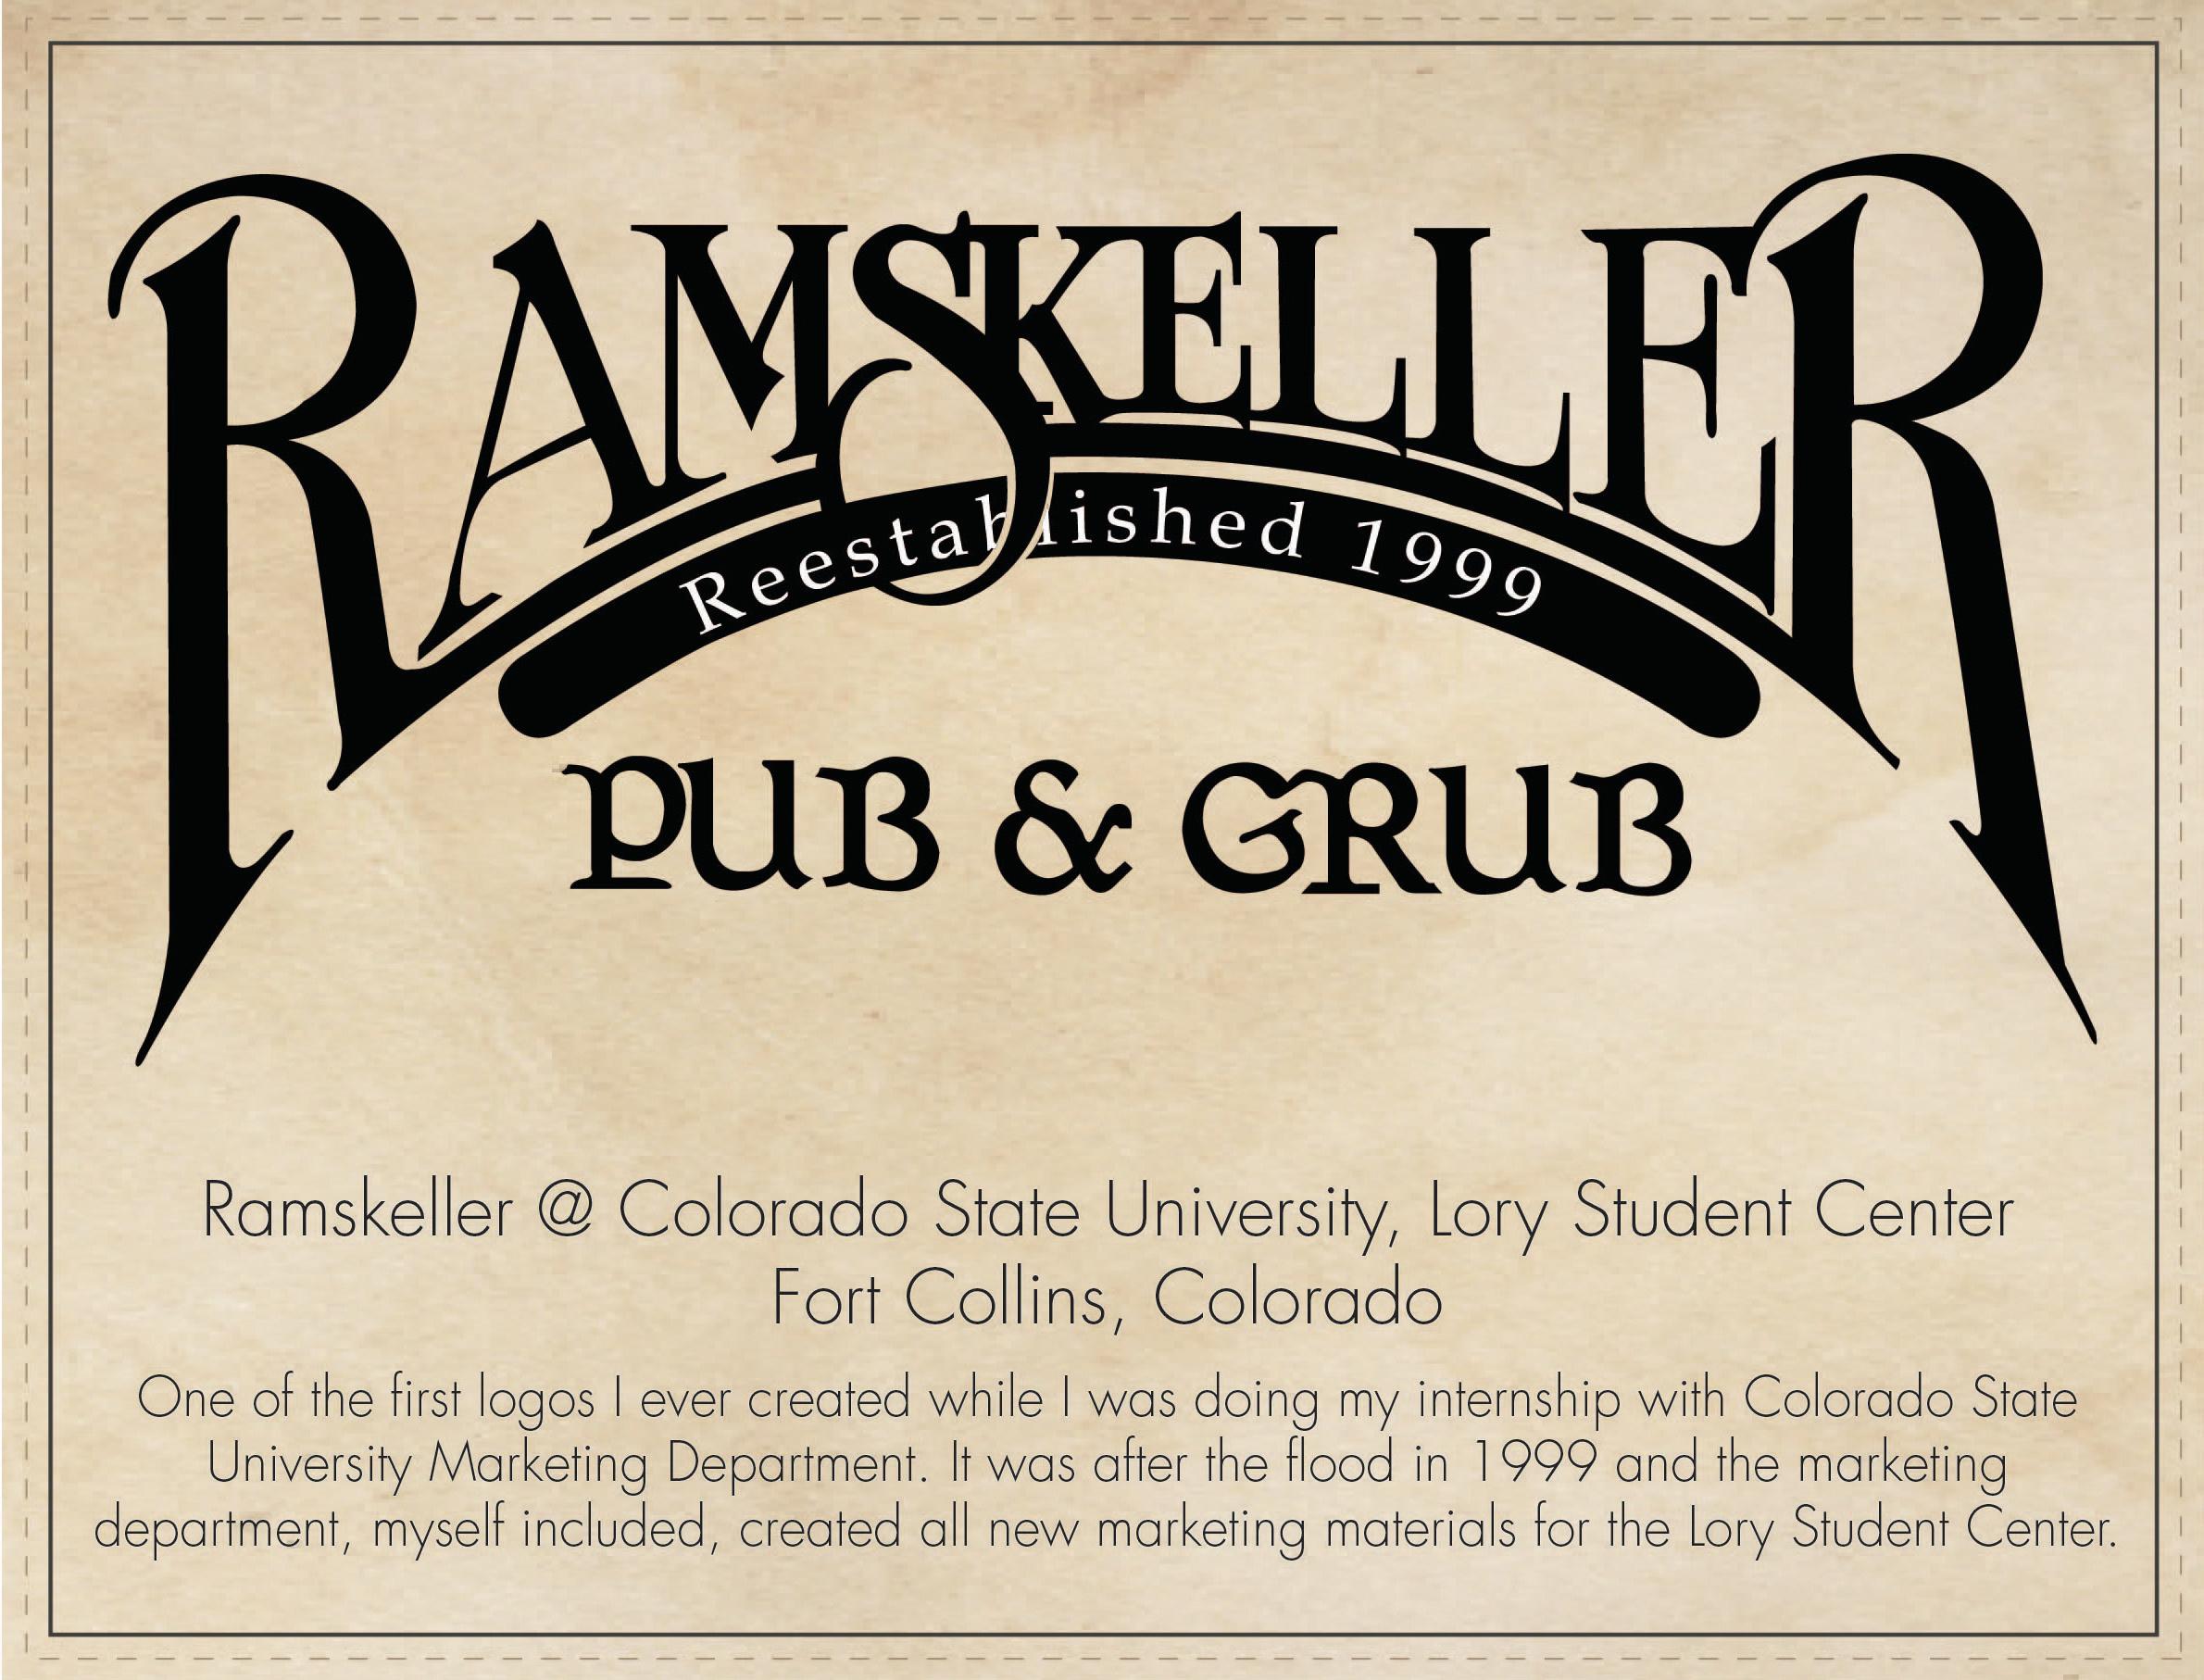 Ramskeller